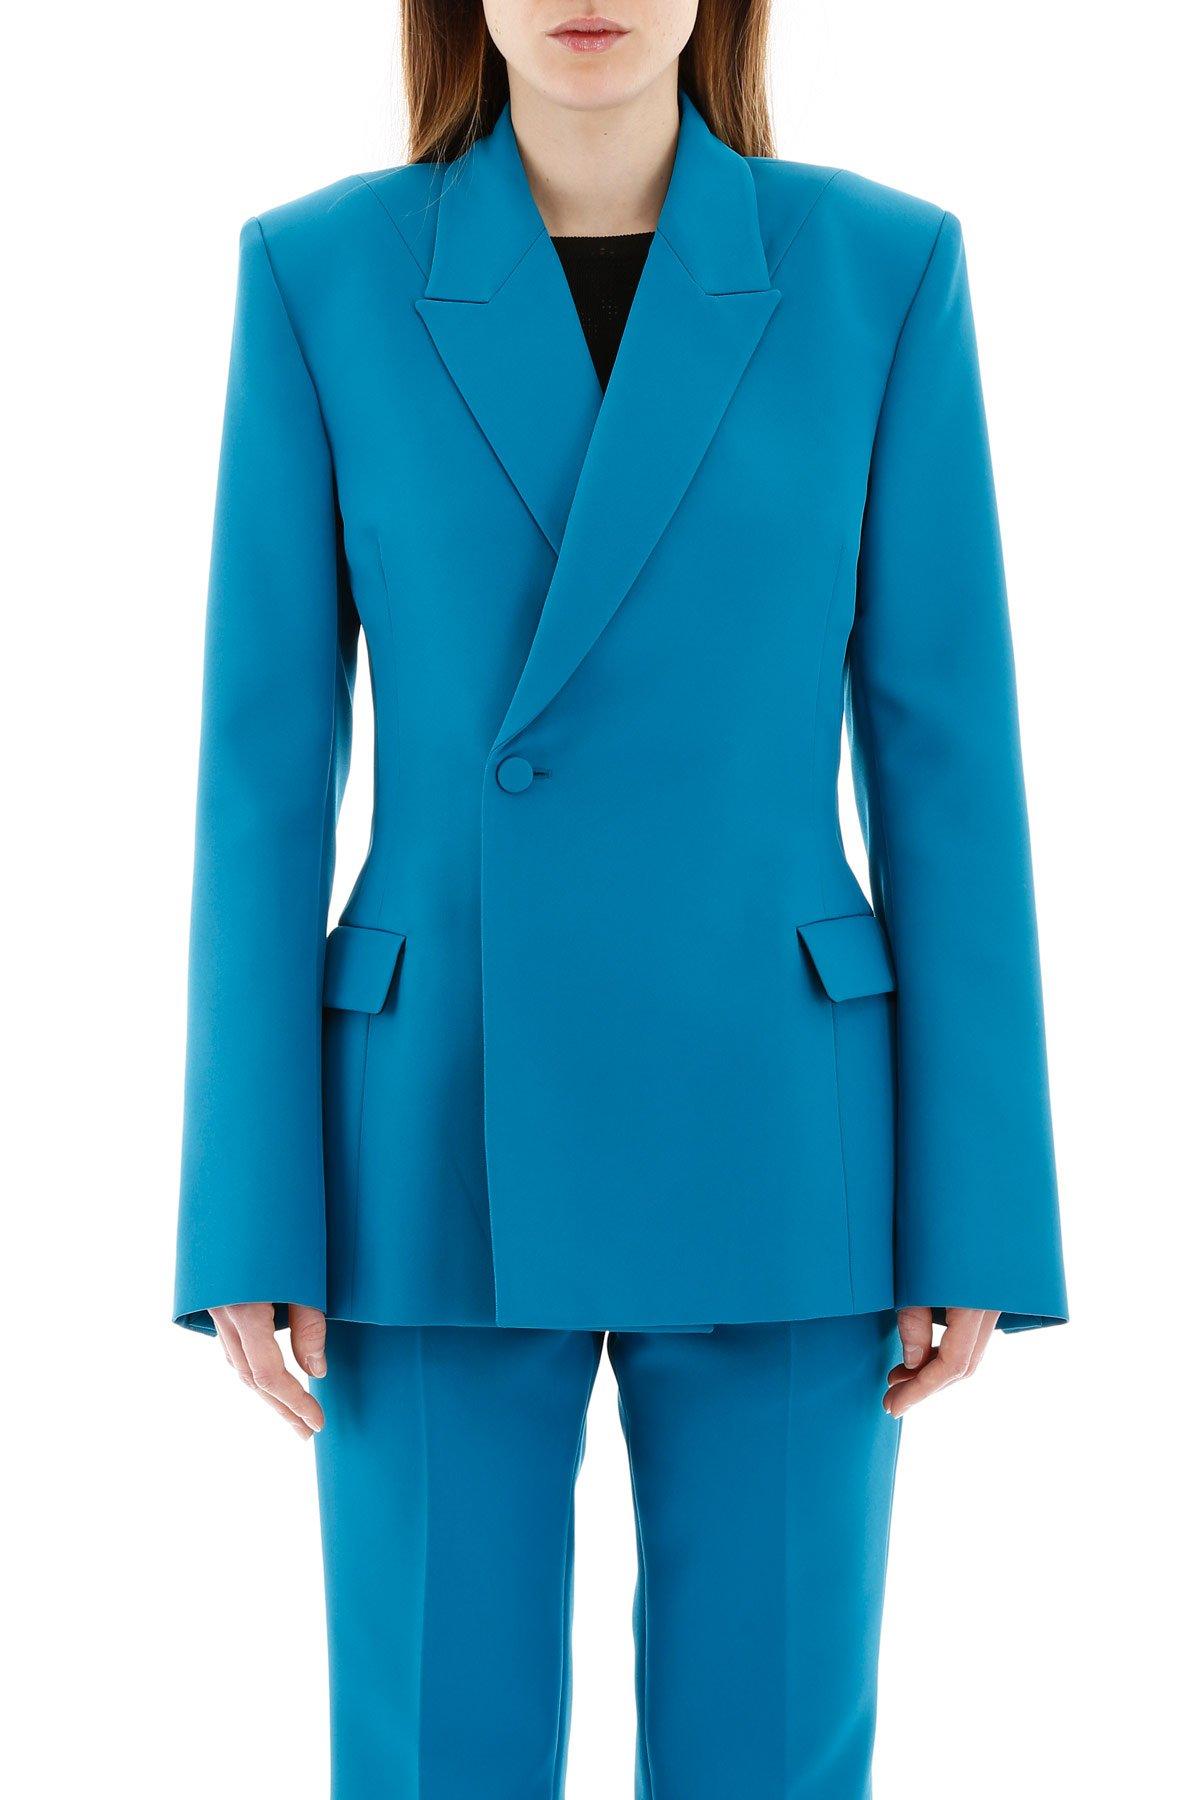 Balenciaga blazer wasted